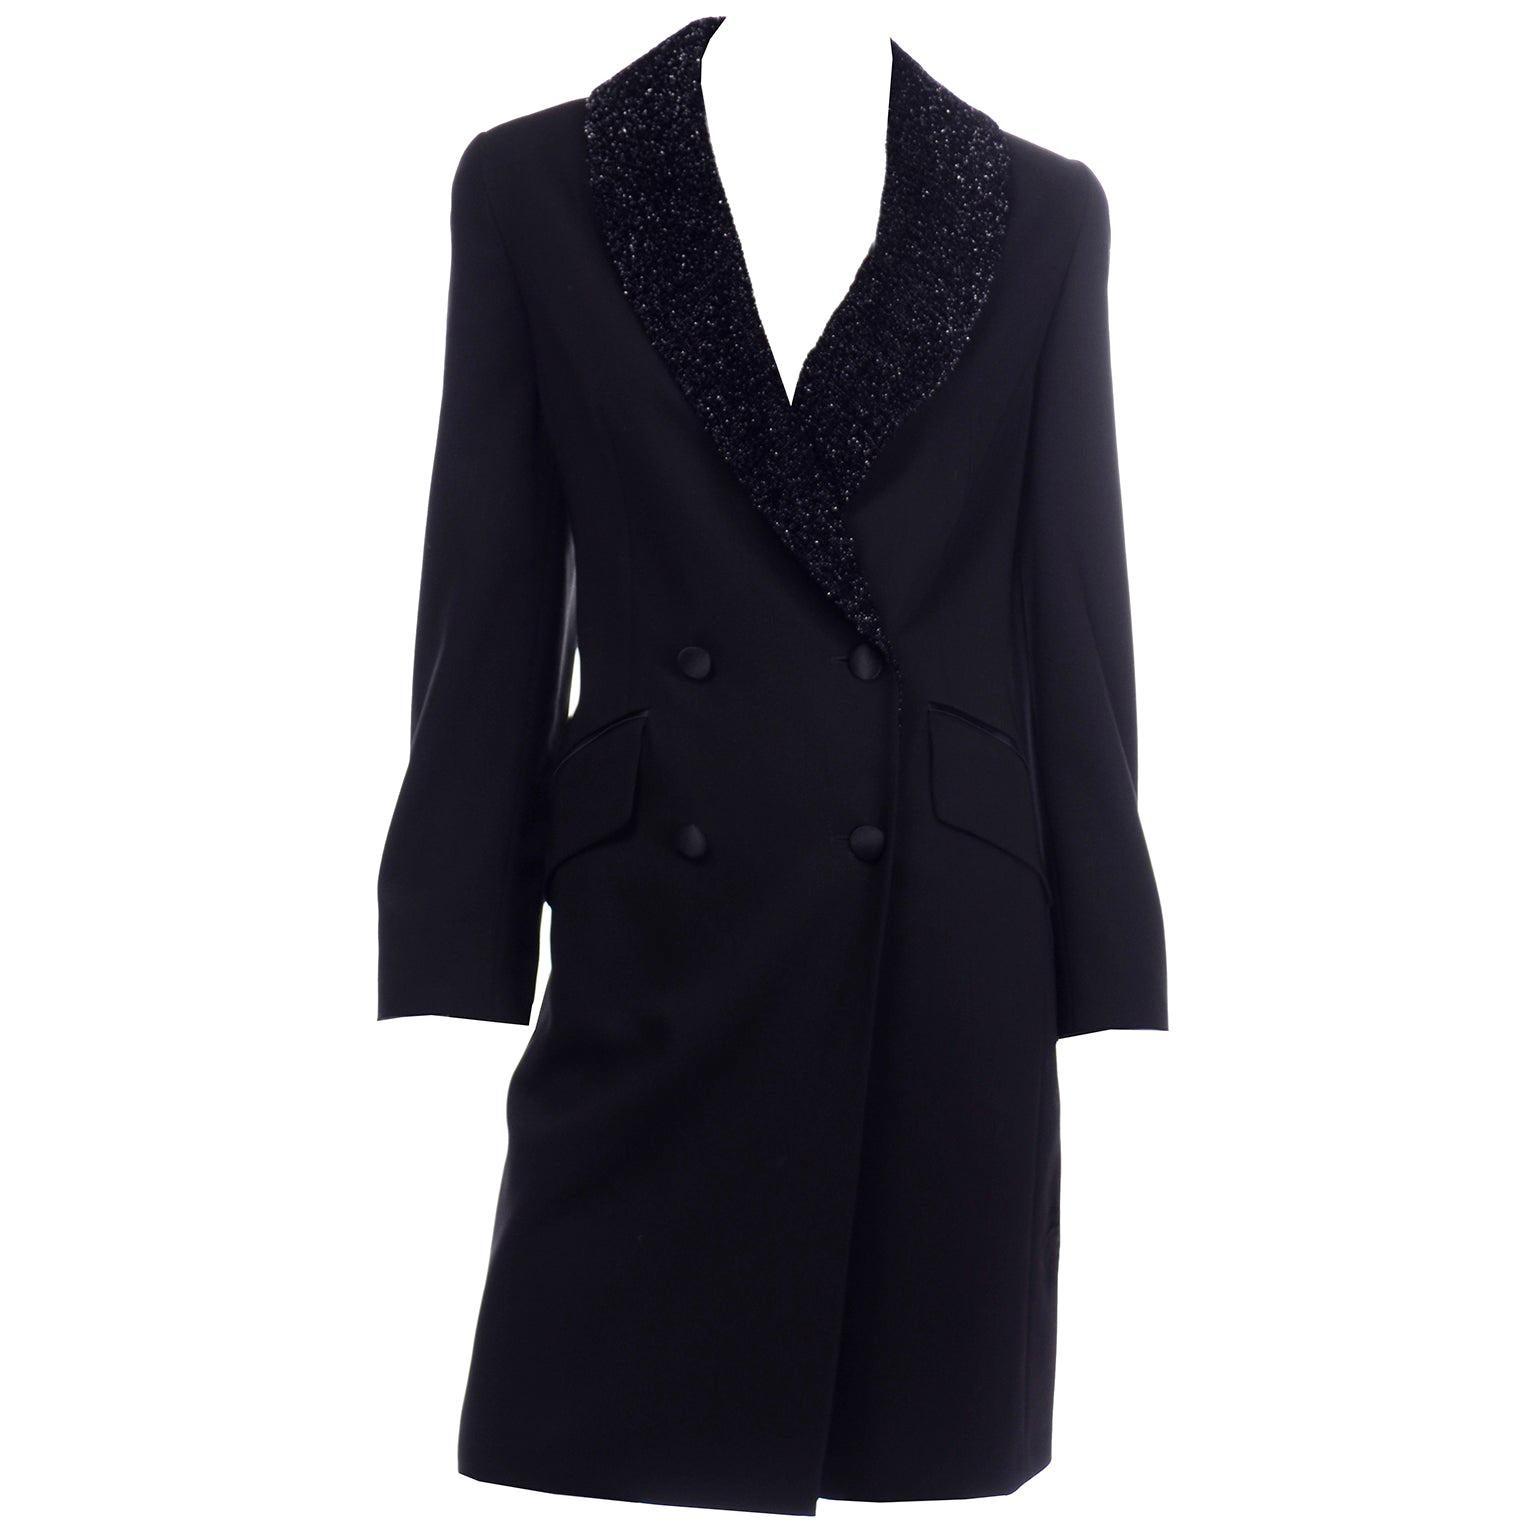 Vintage Louis Feraud Black Blazer Style Evening Coat w Sparkle Fuzzy Lapels